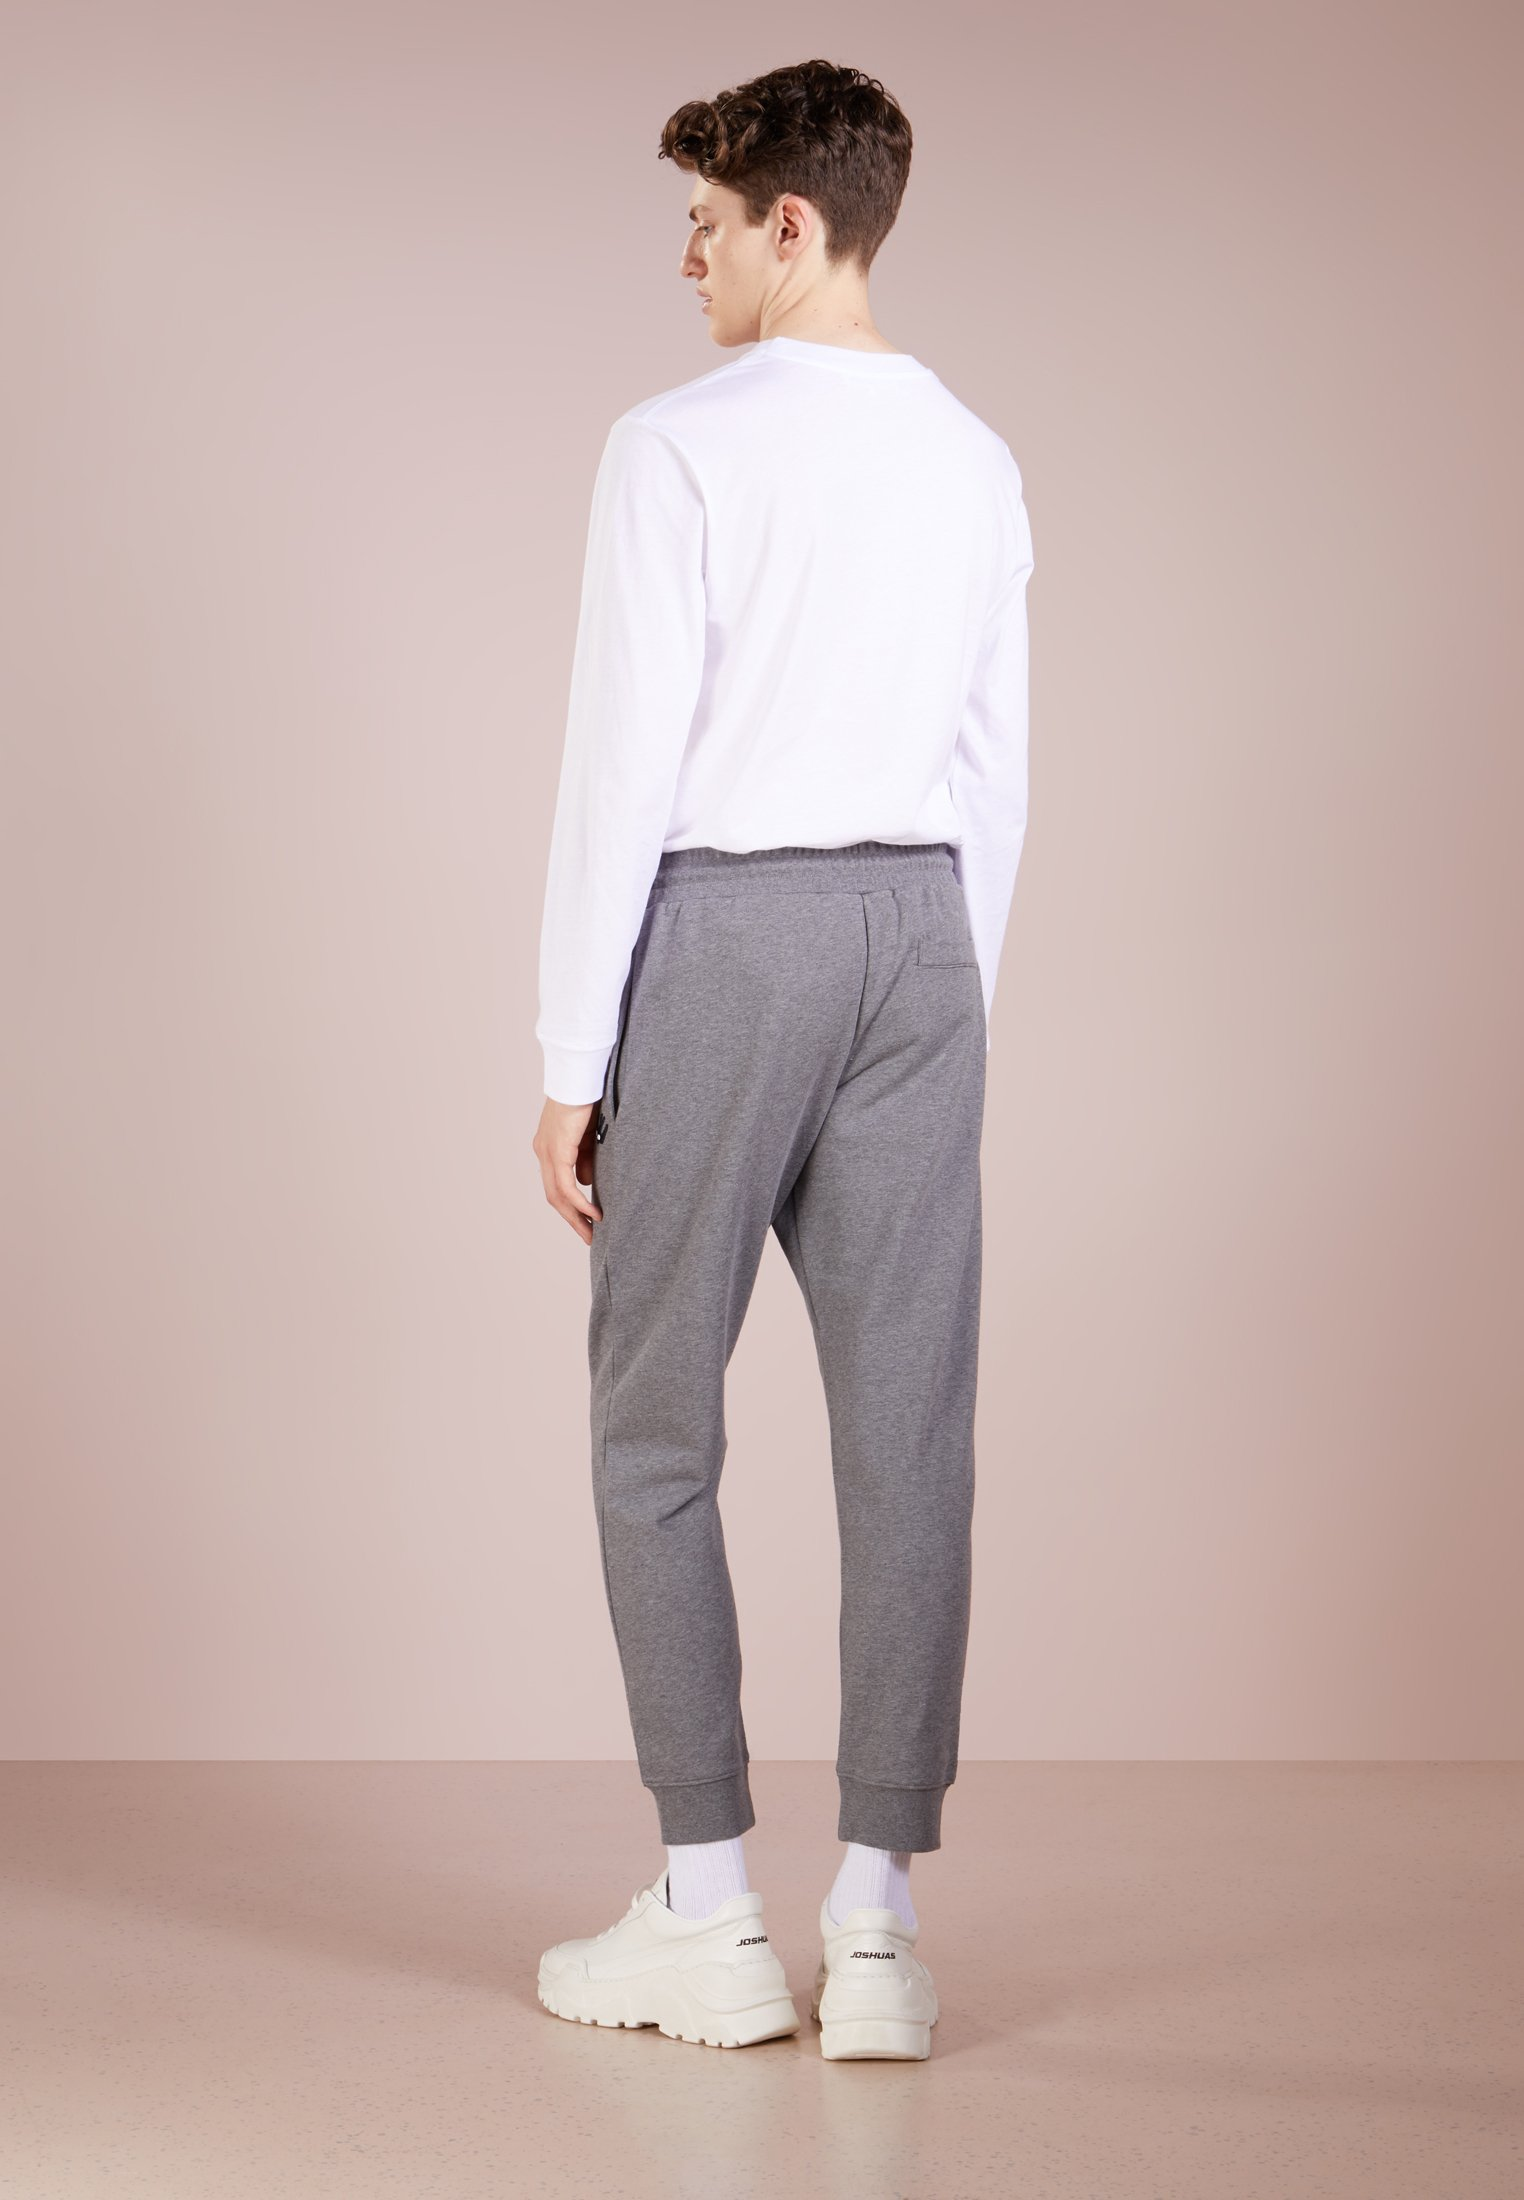 Melange Pantalon SurvêtementGrey Mcq Mcqueen Alexander De MpUzVqSG